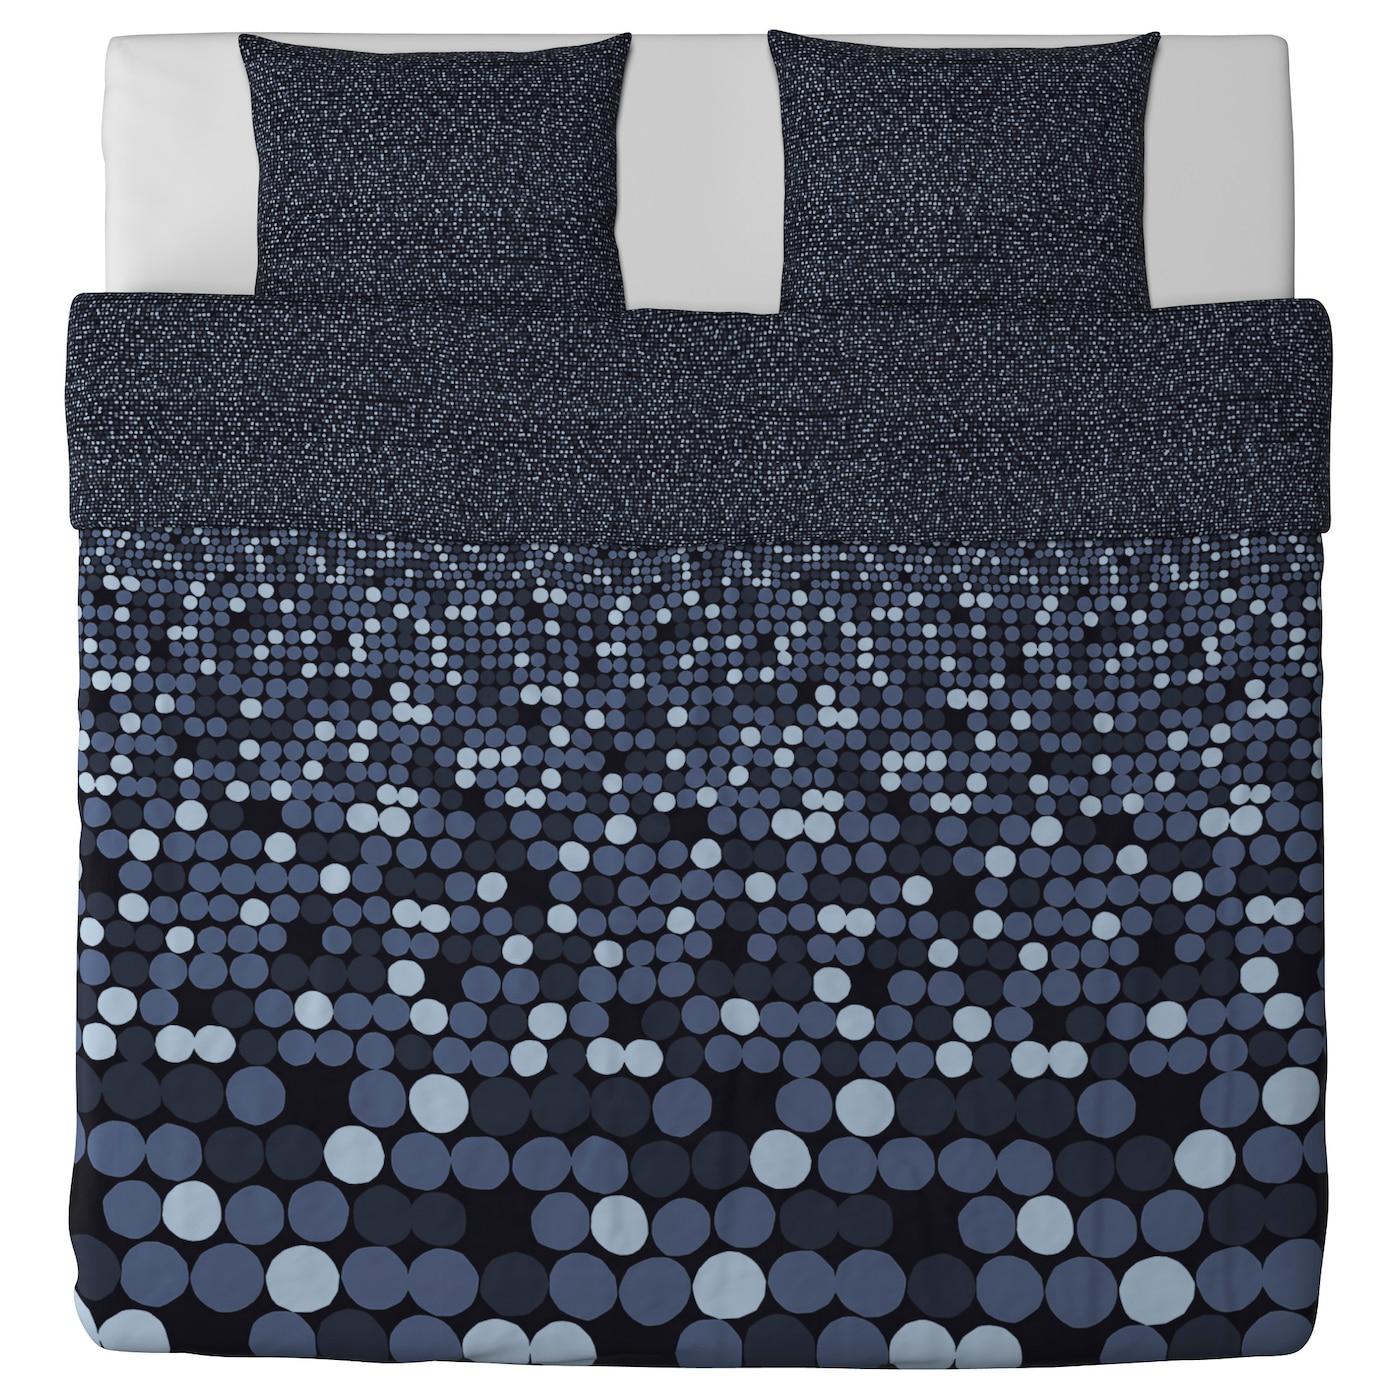 textile horeca ikea. Black Bedroom Furniture Sets. Home Design Ideas